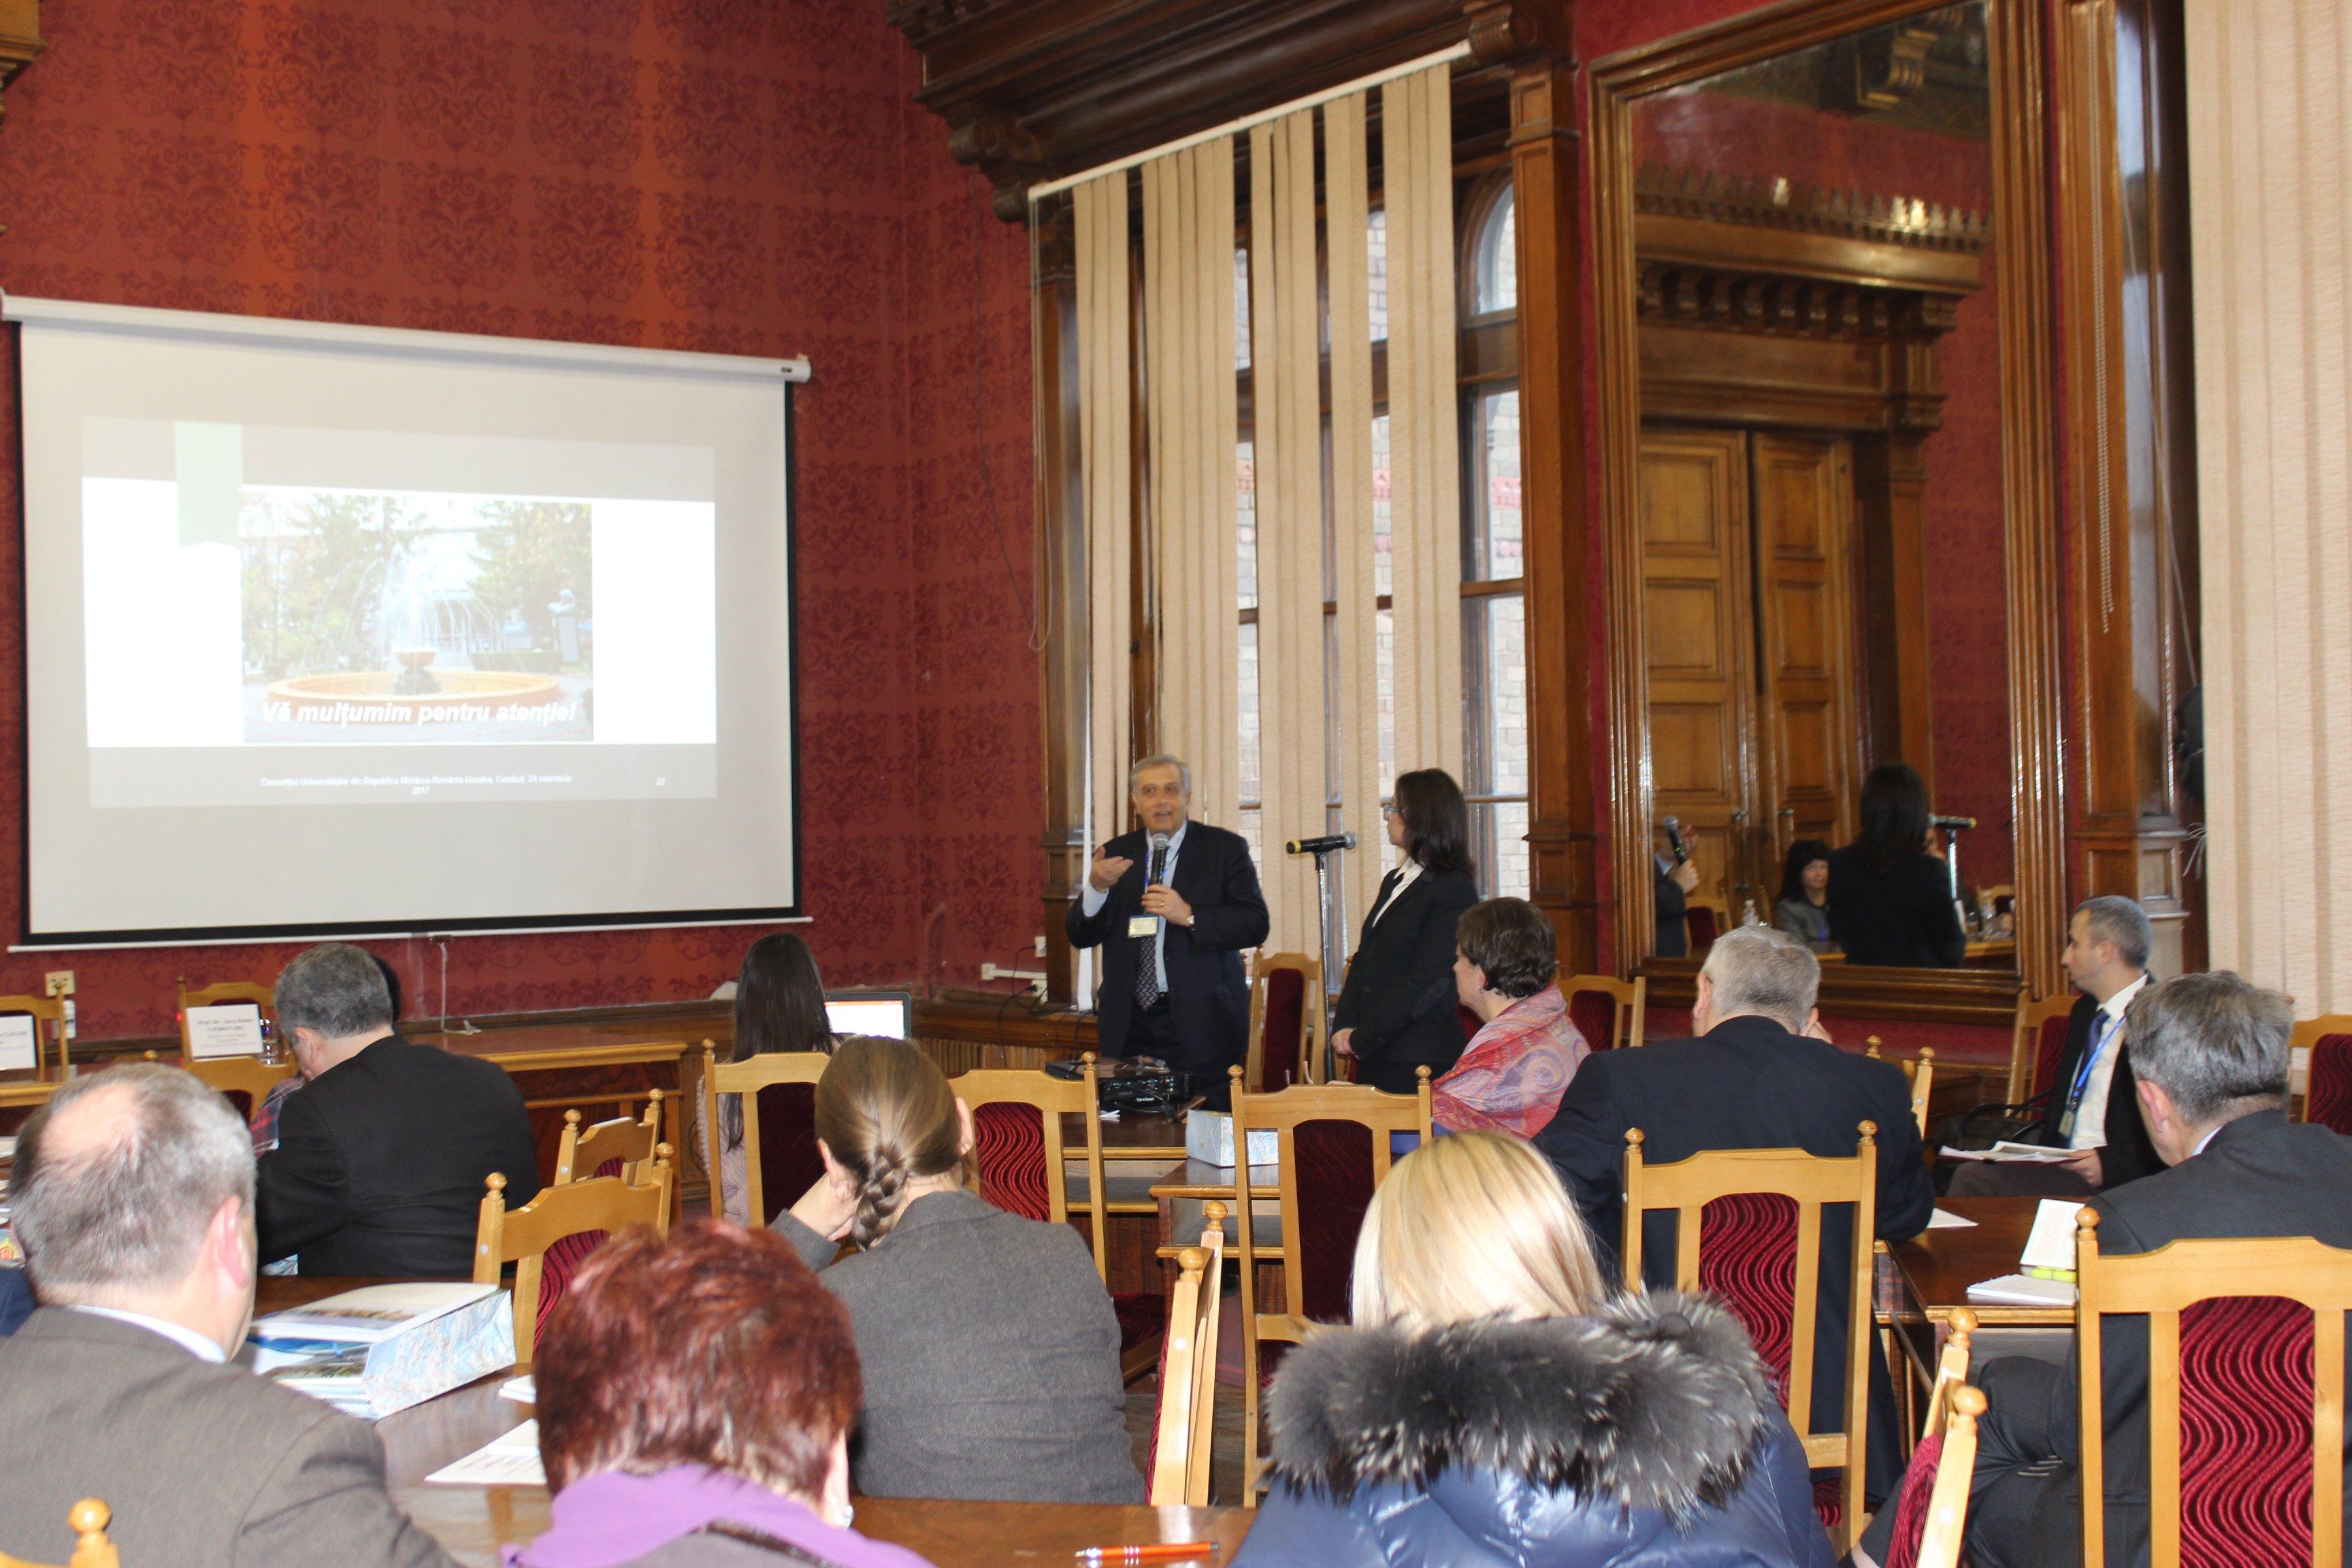 Agence Intalnire Ucraina Femeia care cauta om in Marrakech